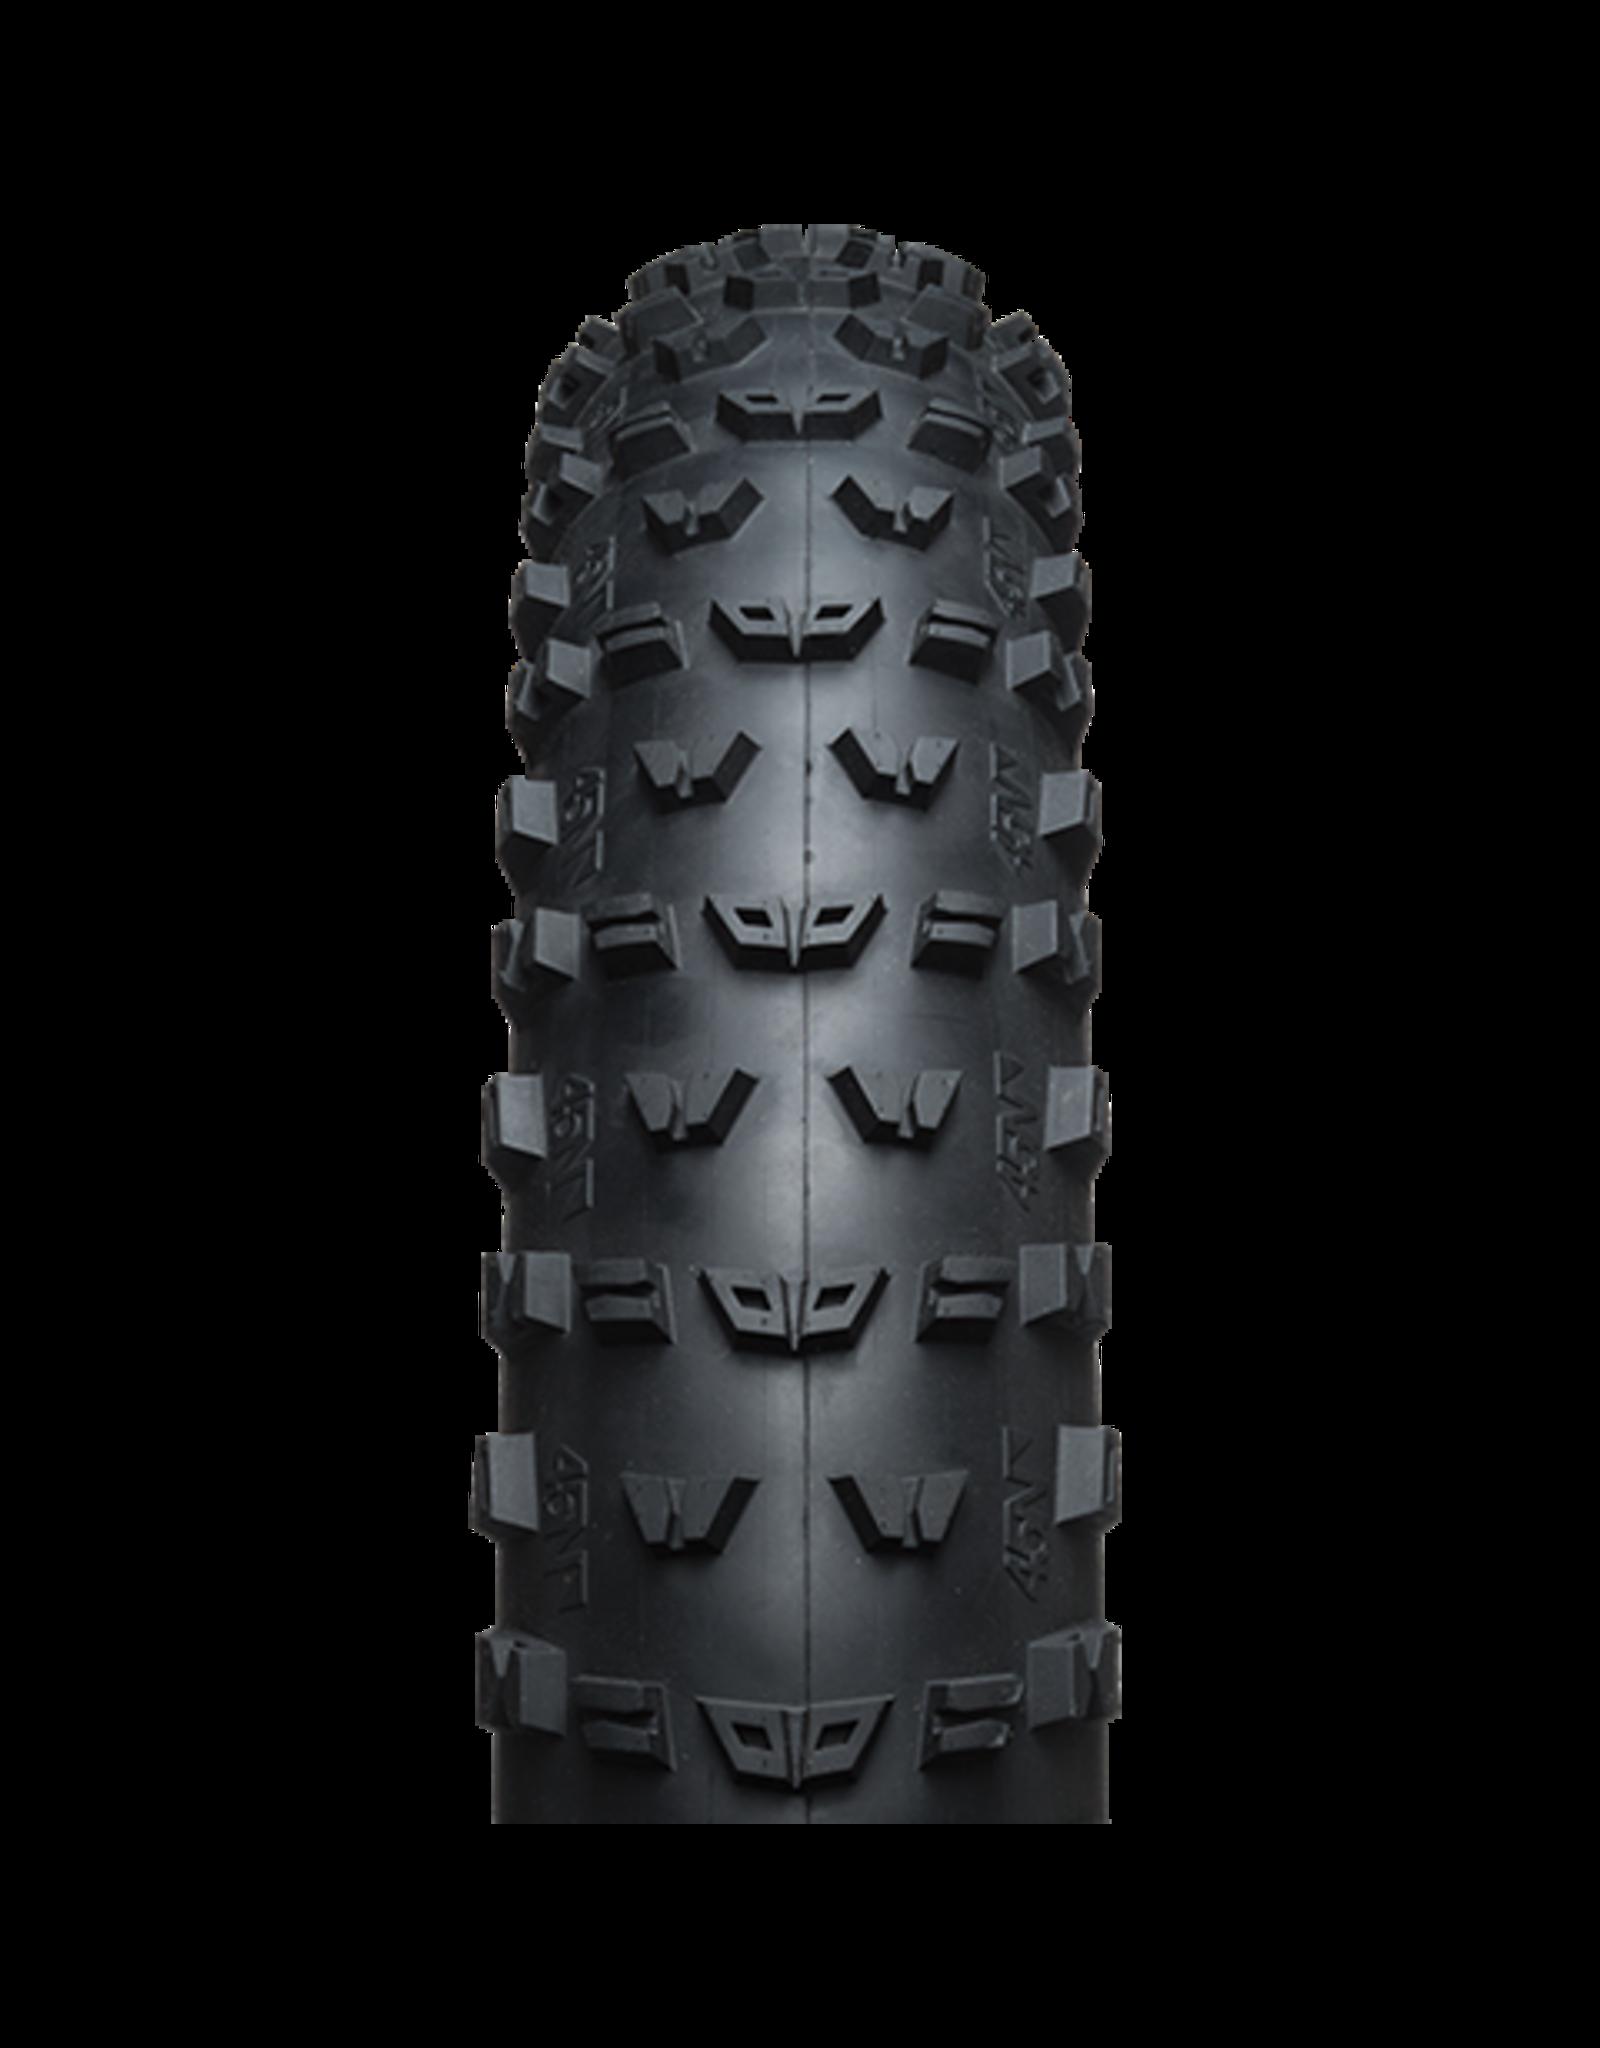 45NRTH 45NRTH Dunderbeist 26x4.6 120tpi tire